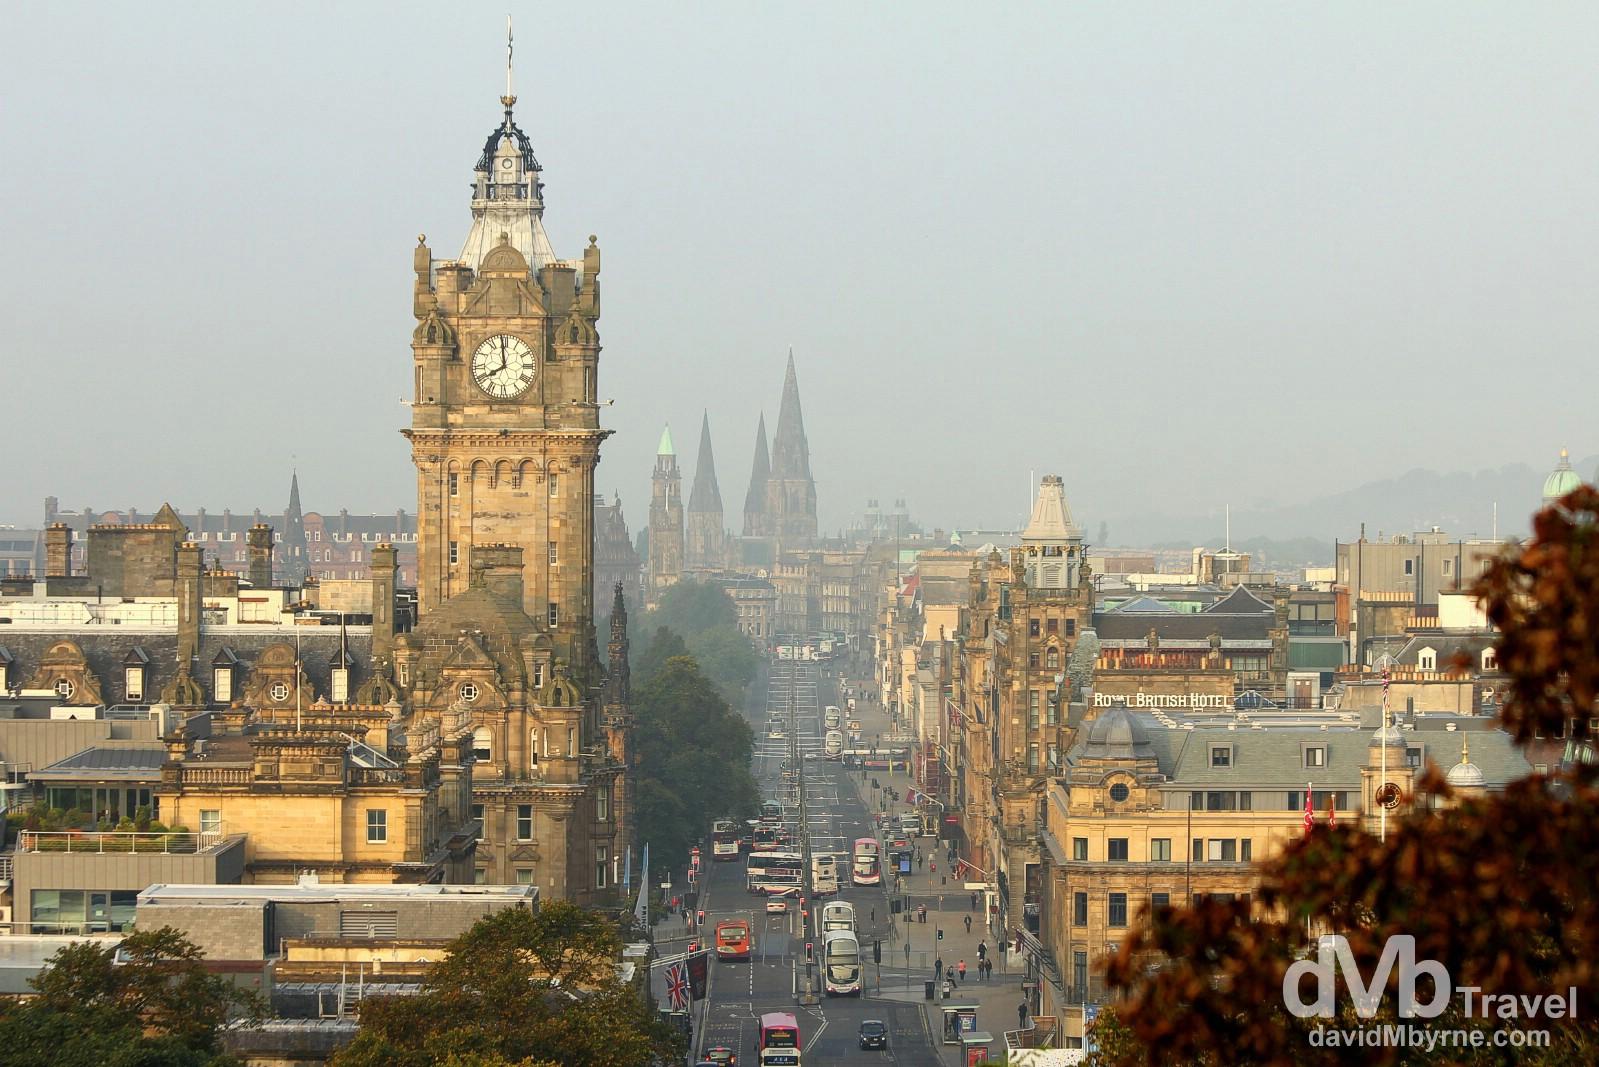 Morning activity on Princess Street as seen from Calton Hill in Edinburgh, Scotland. September 13, 2014.